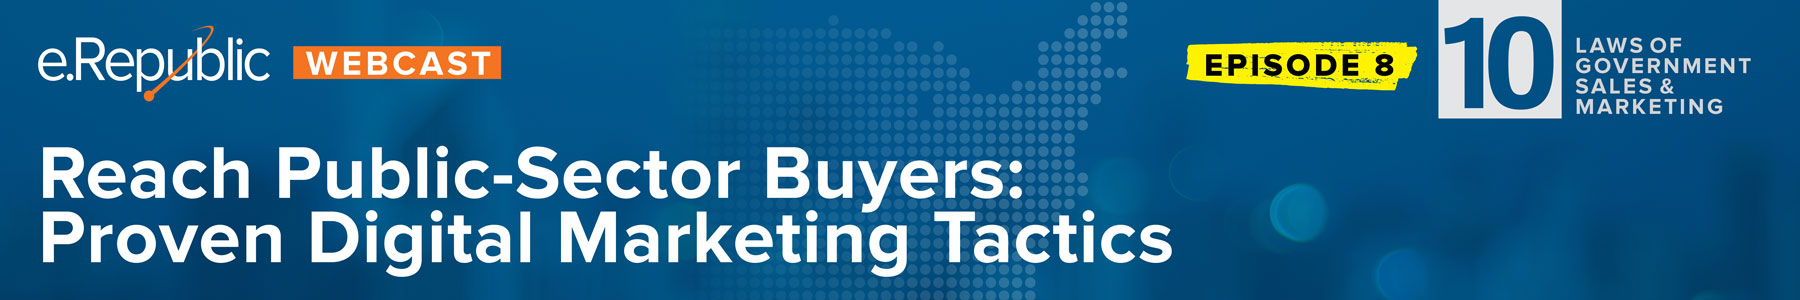 Episode 8: Reach Public-Sector Buyers: Proven Digital Marketing Tactics